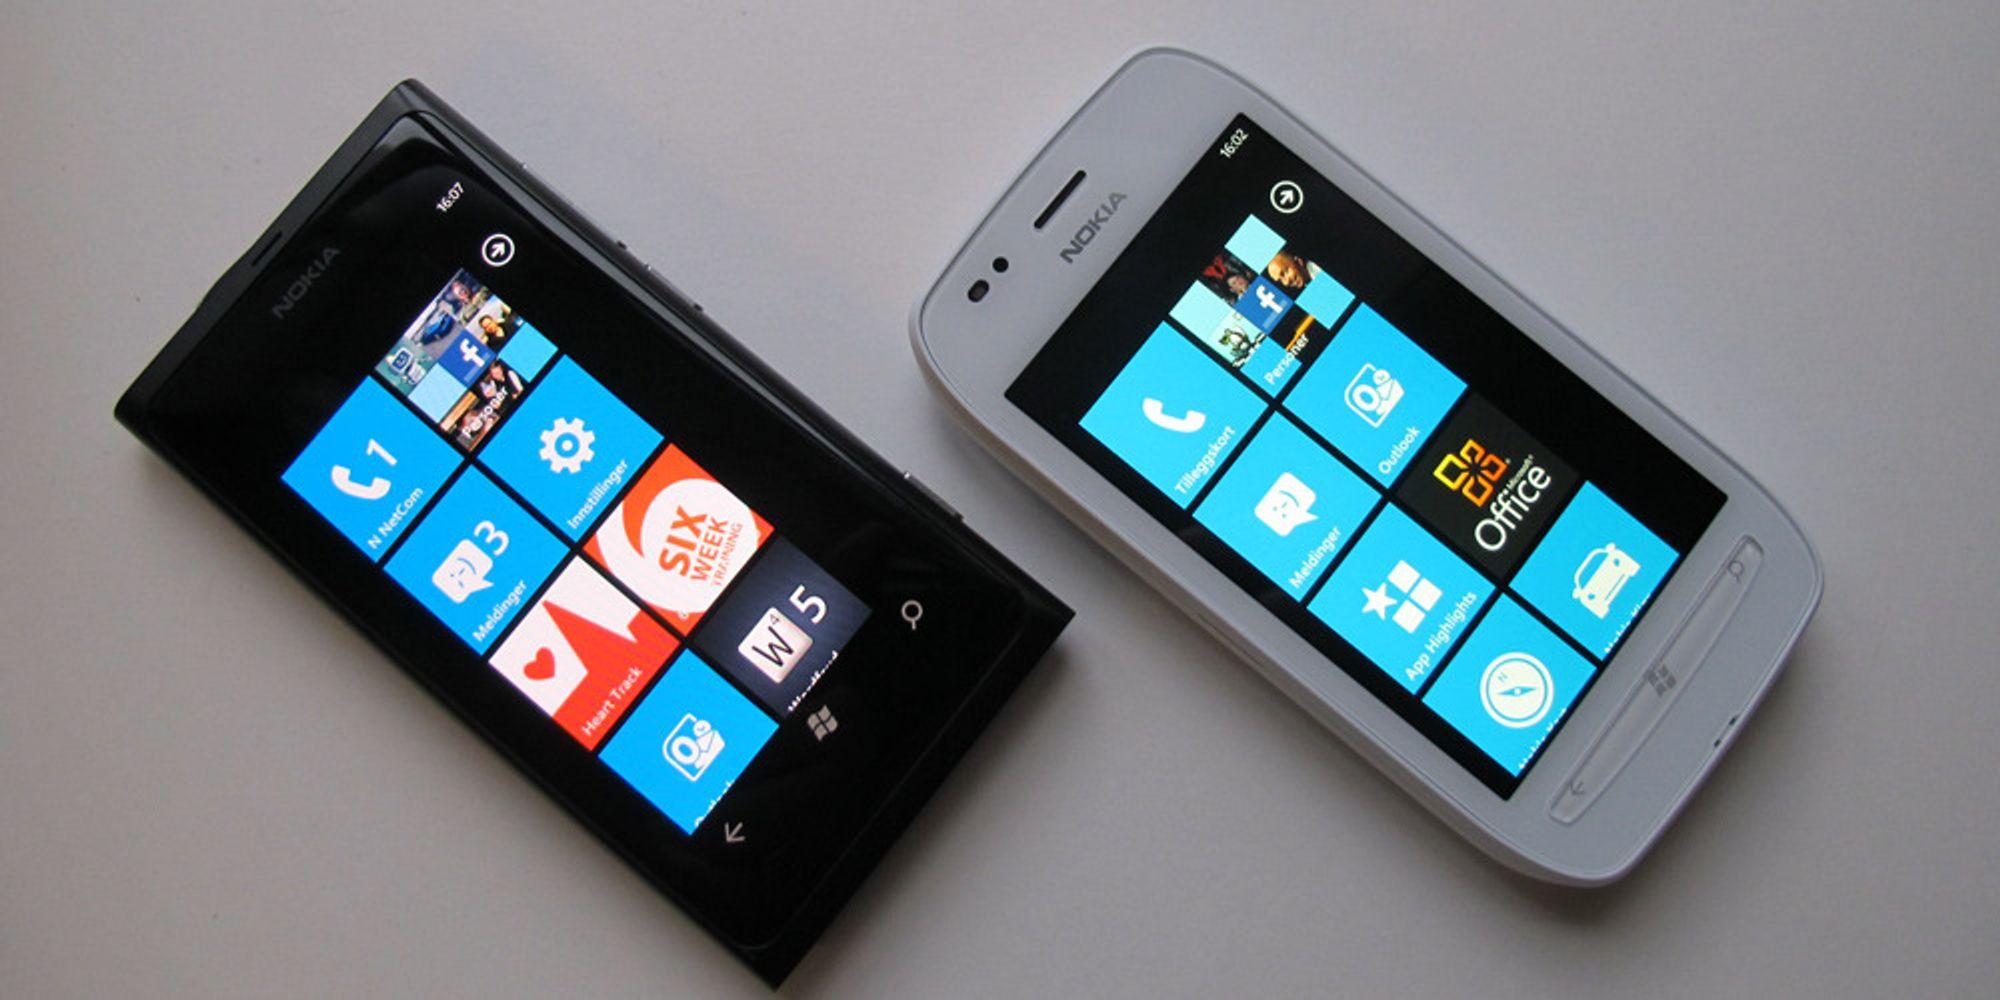 Nokia Lumia 800 VS Lumia 710